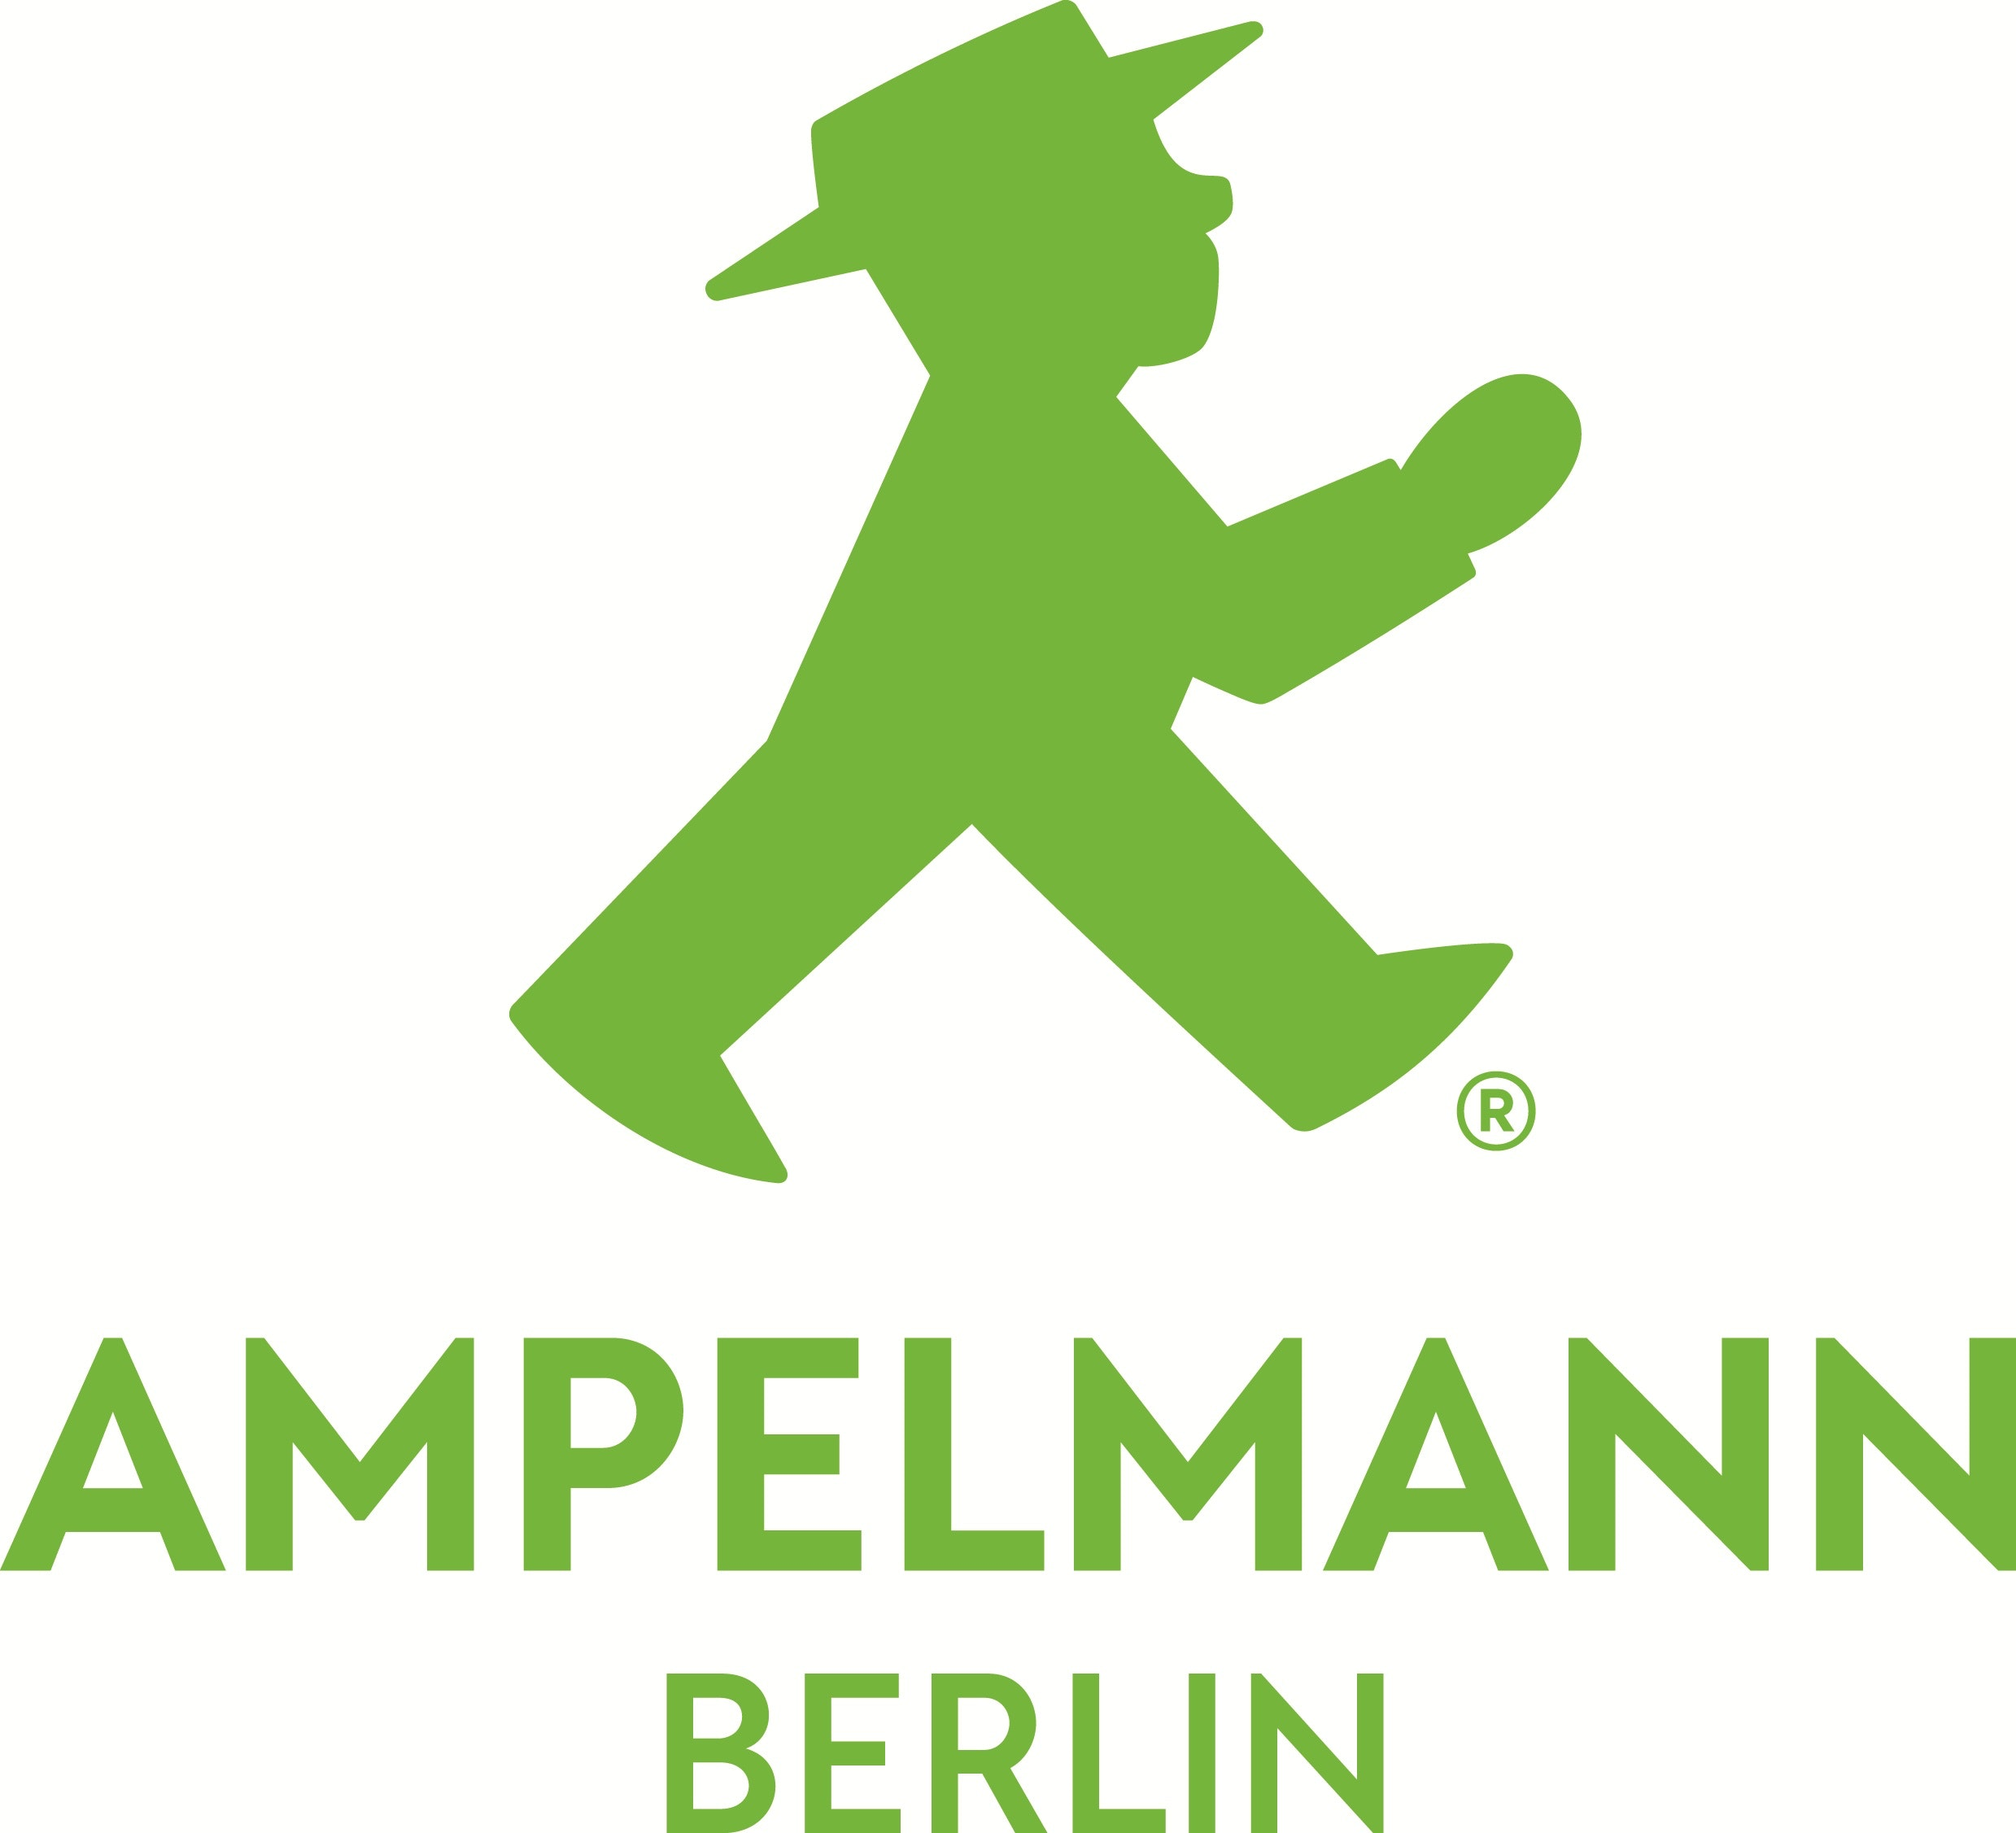 AMPELMANN Berlin Logo